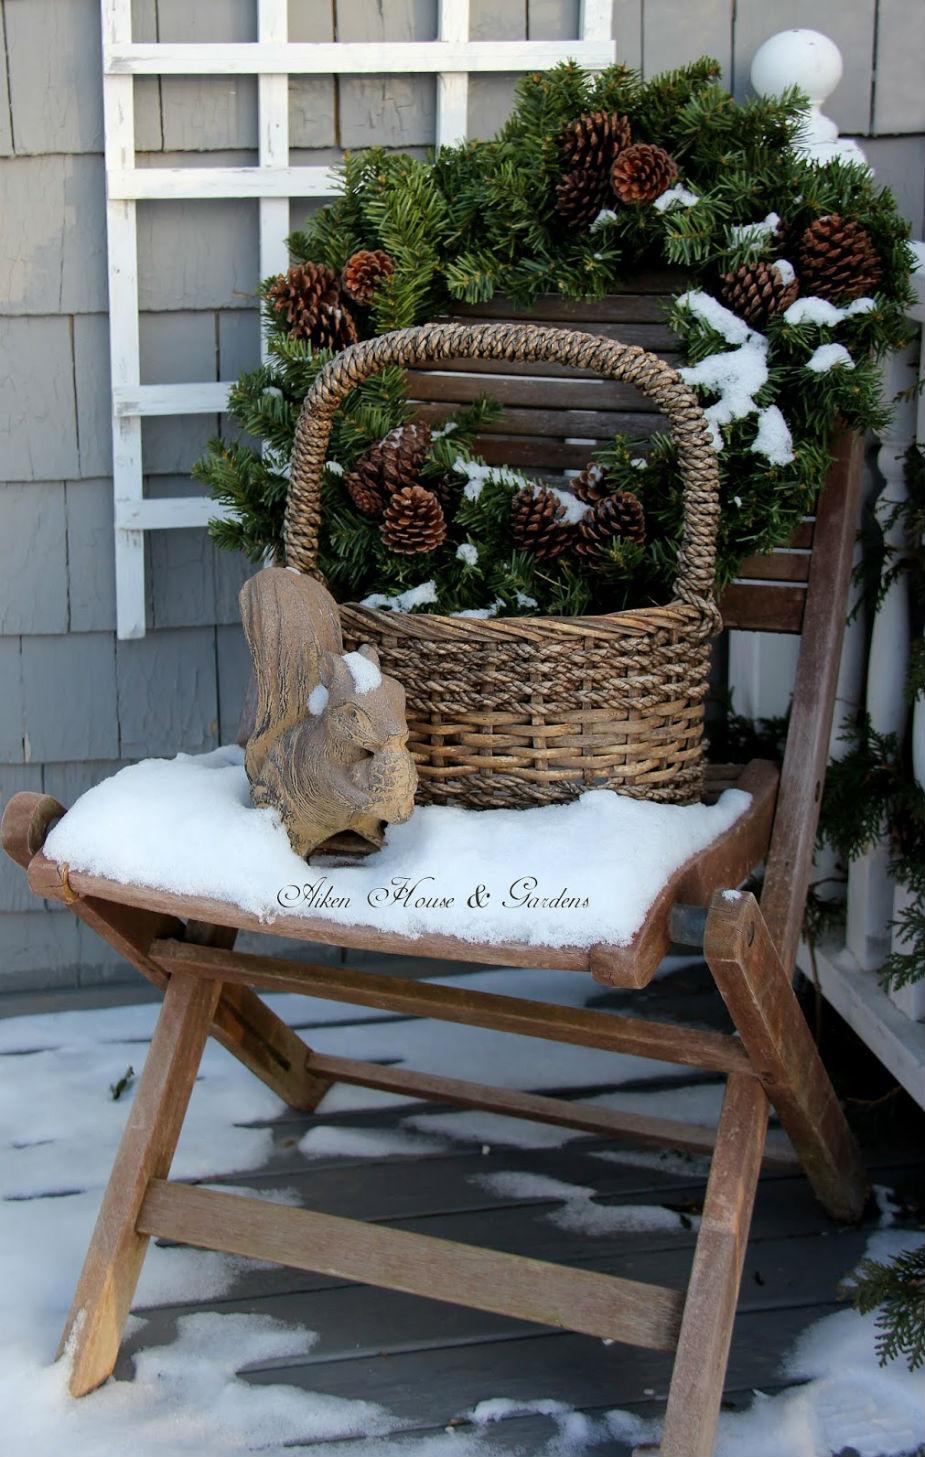 porch-chair-IMG_7574-22.jpg